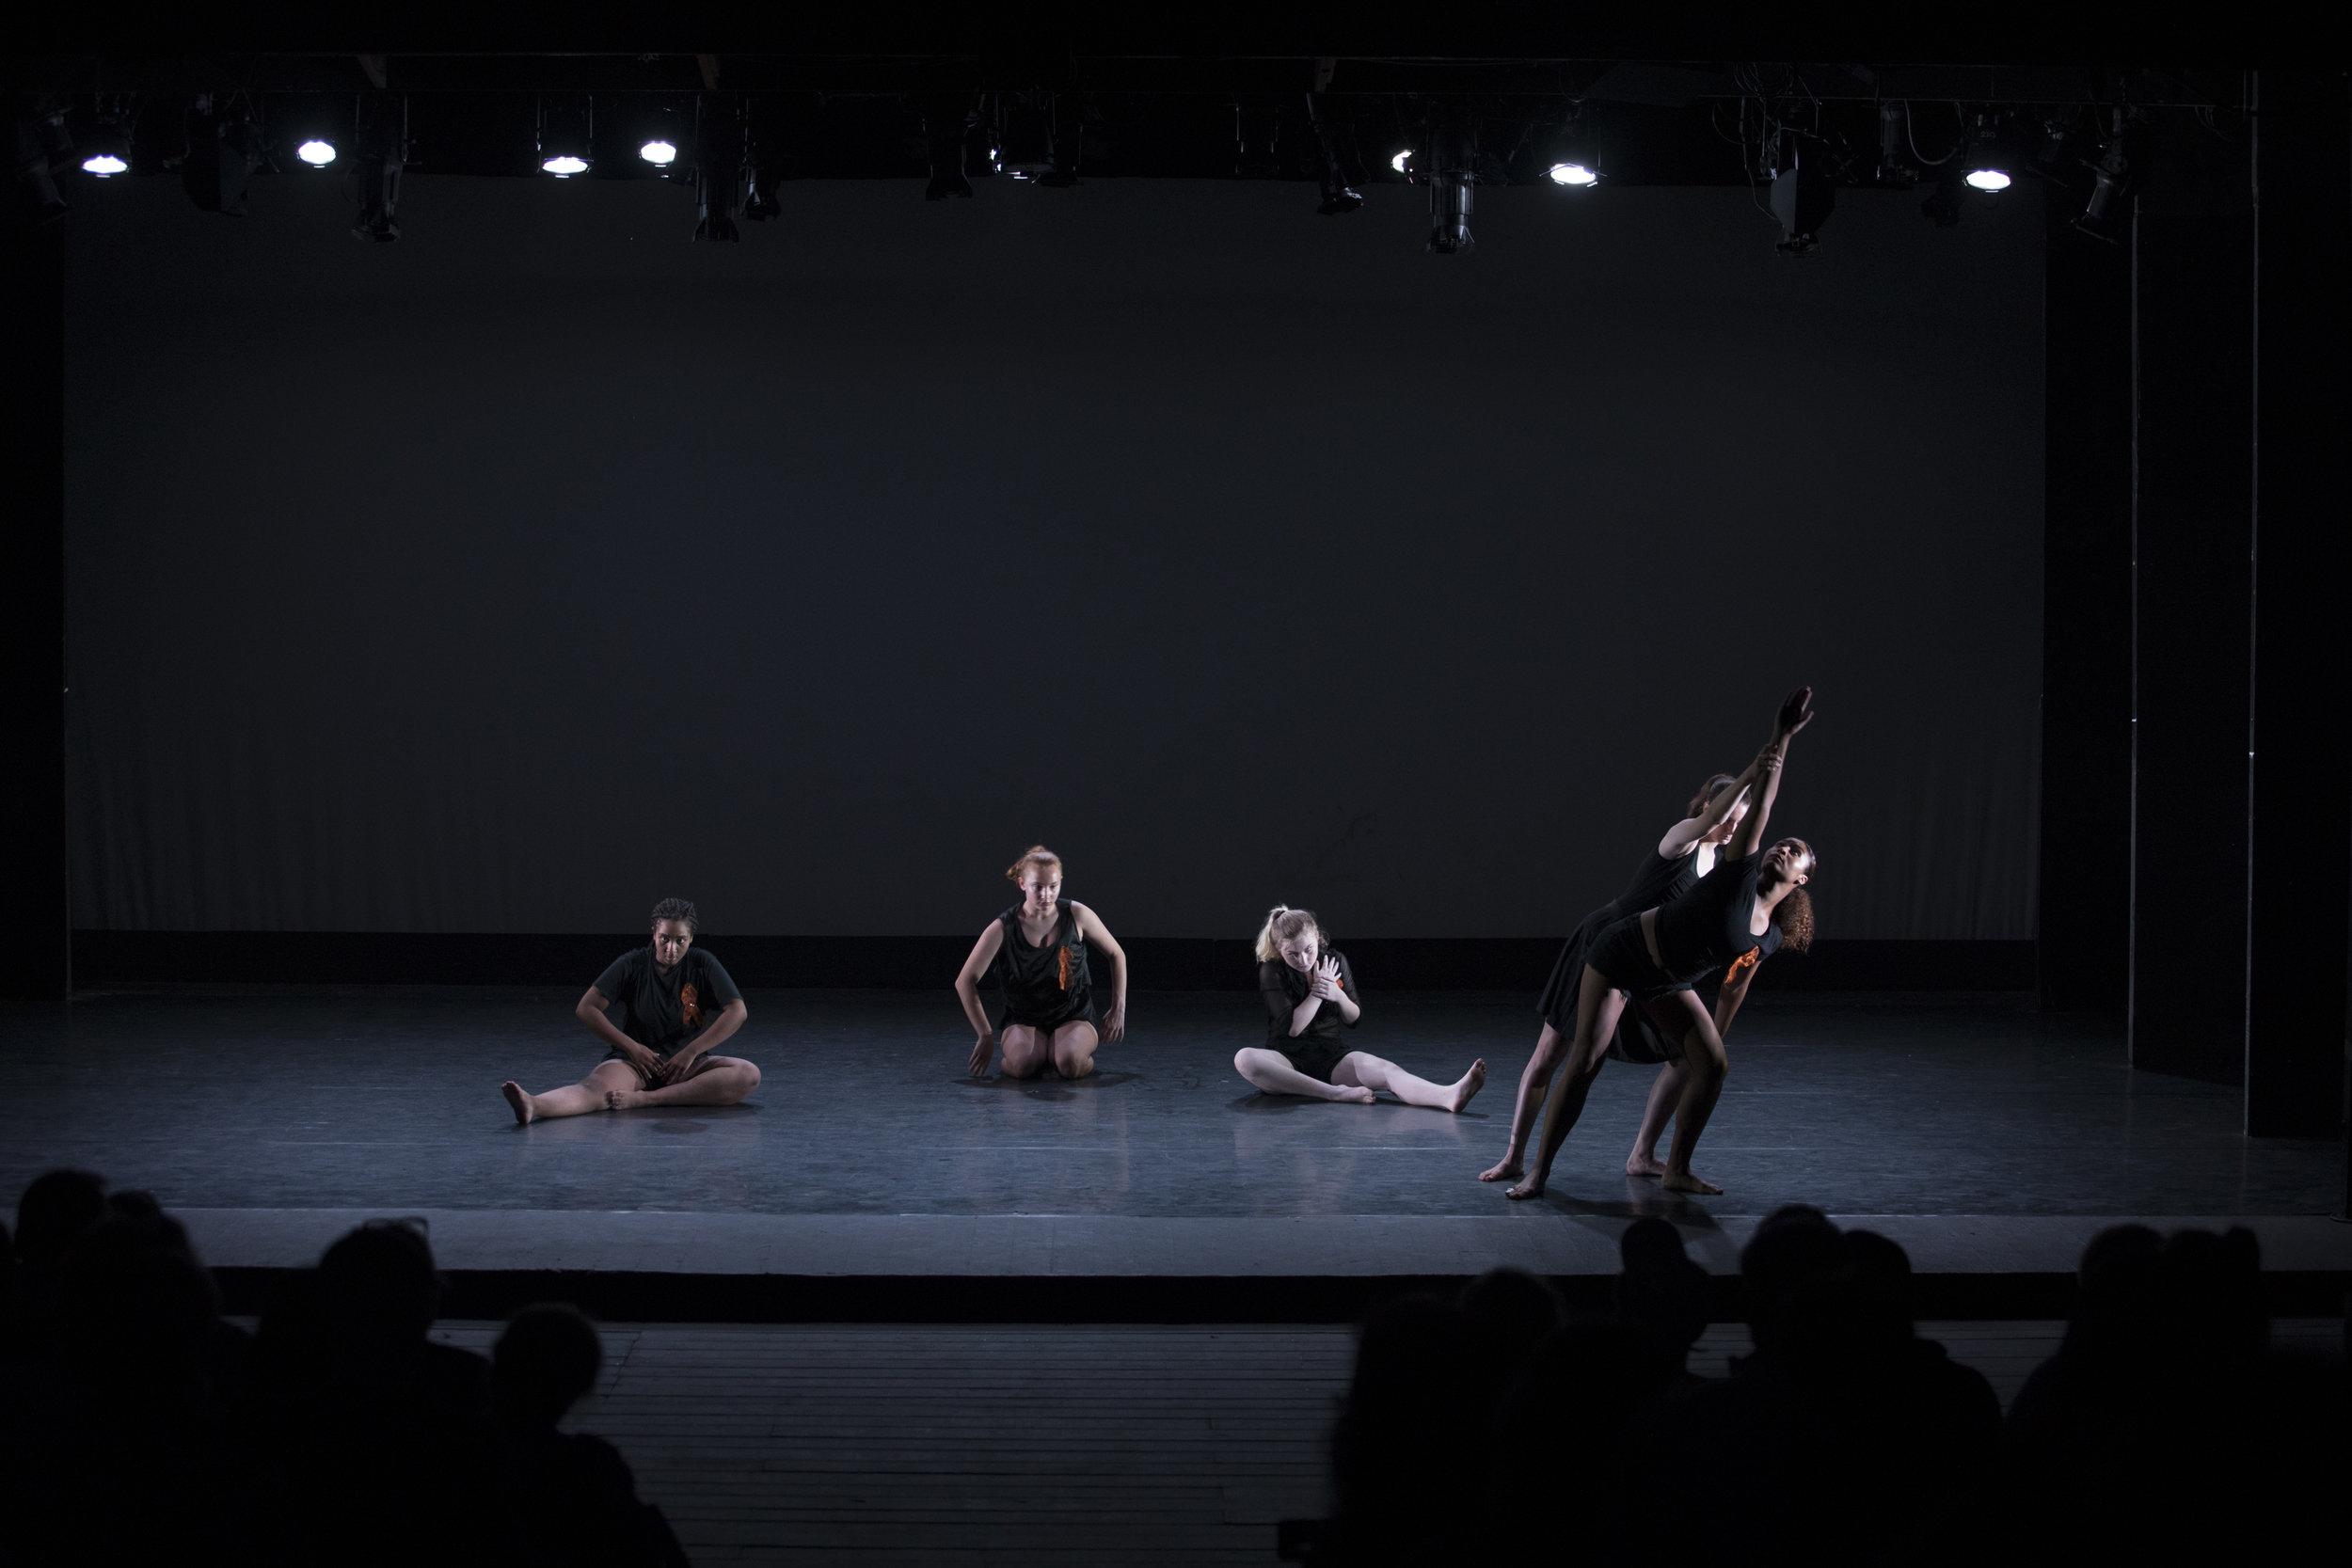 Dance Show by Jehanne-Marie Milne-158.jpg